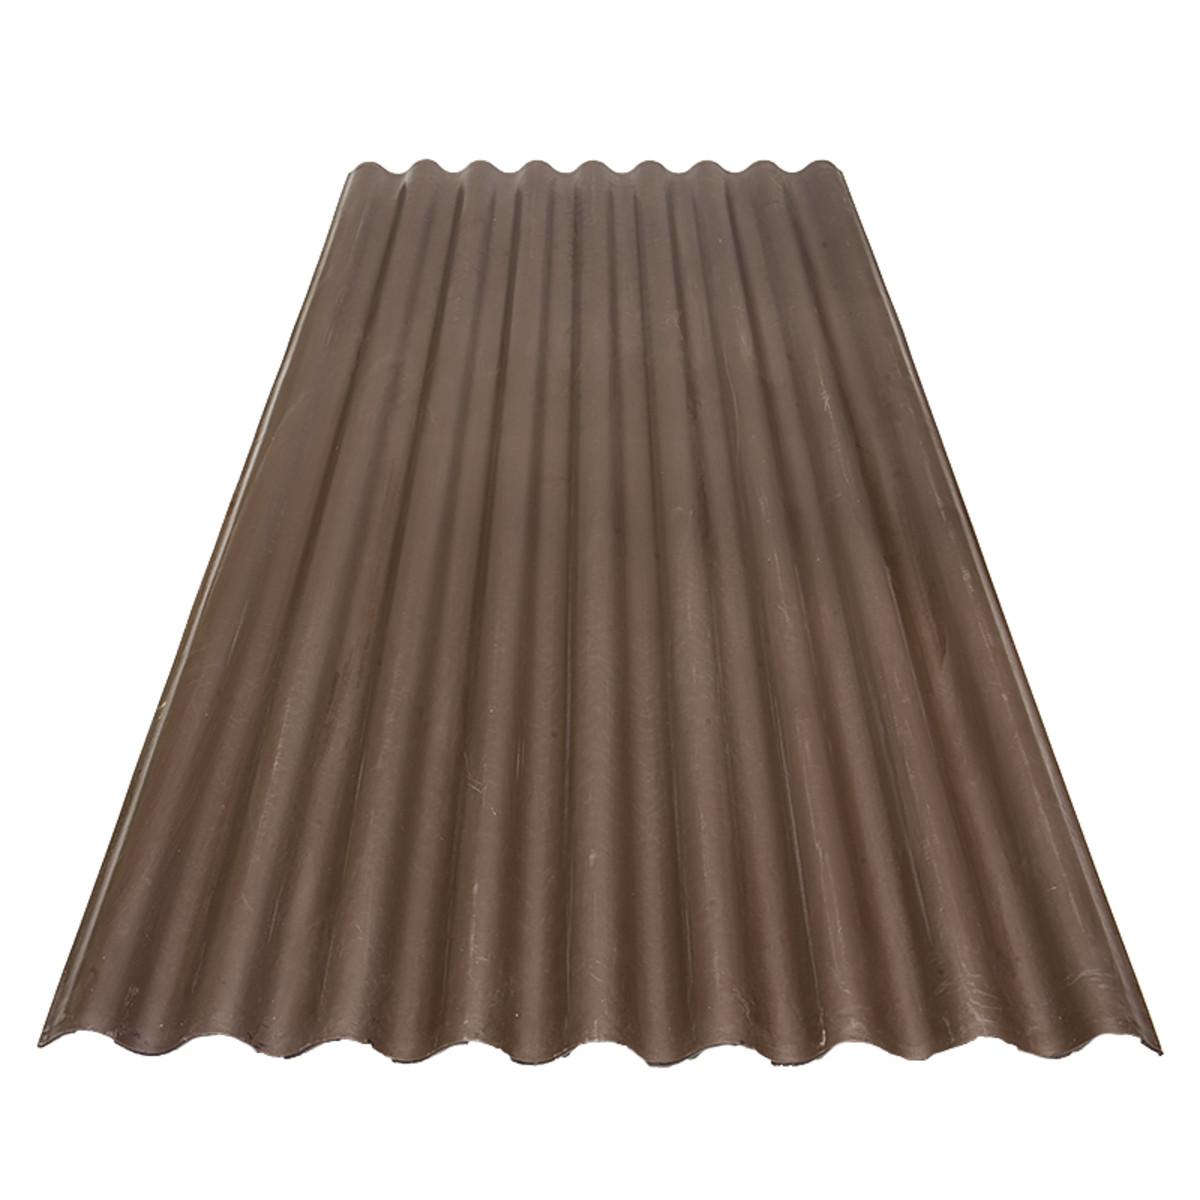 Лист Керамопласт 5x900x2000 мм цвет коричневый